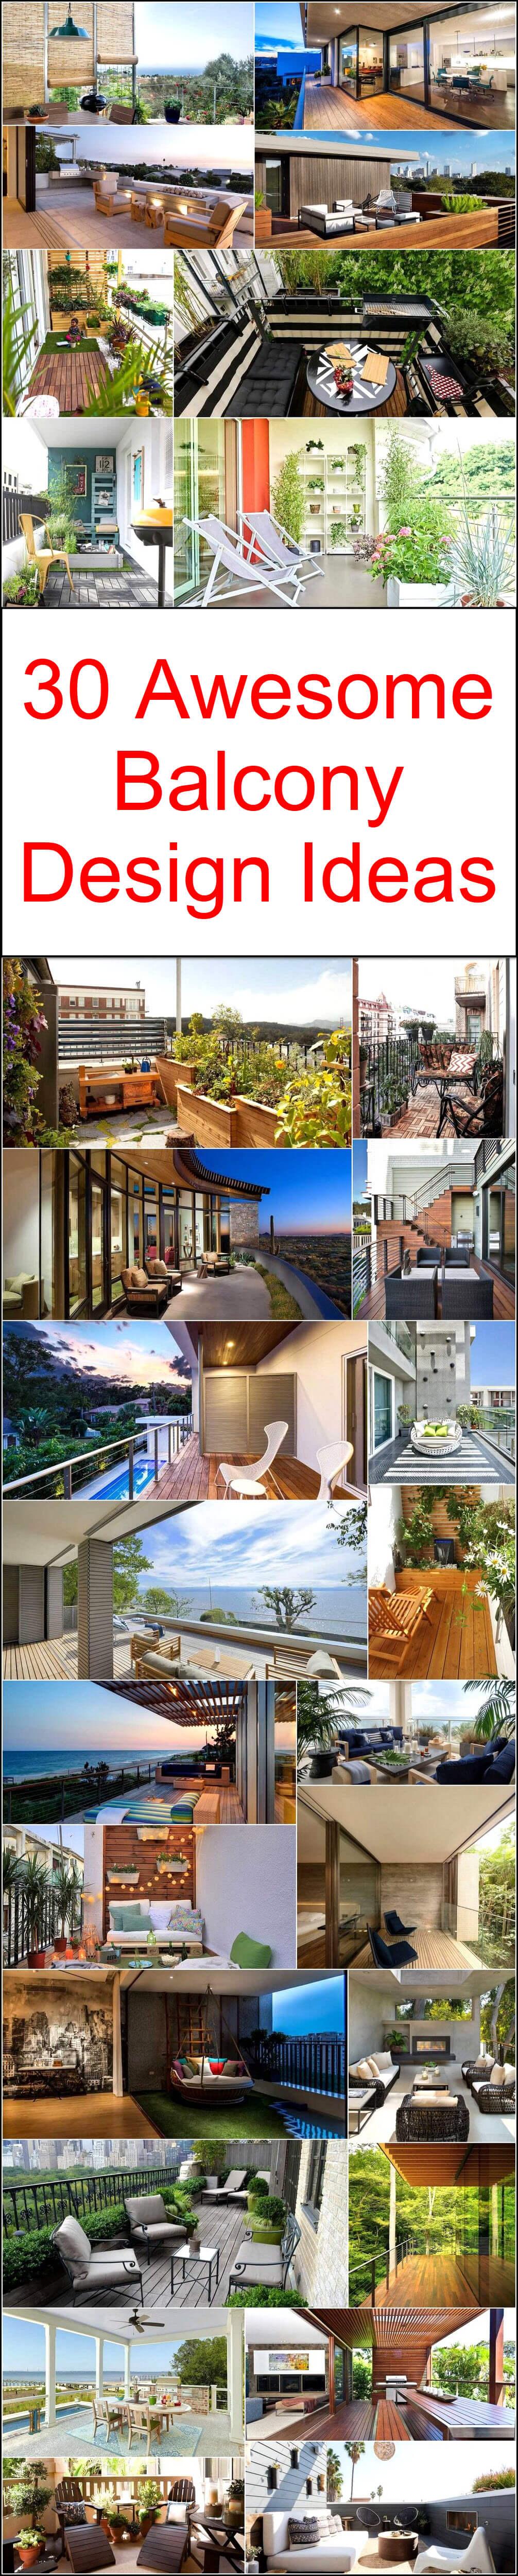 30 Awesome Balcony Design Ideas